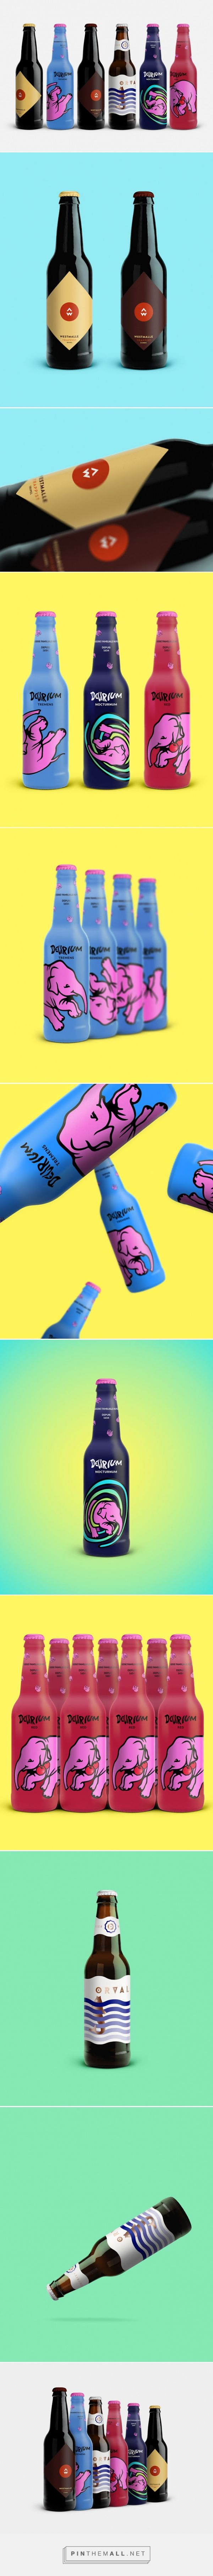 Belgian Beers Labels Redesign /Concept / designer / Ján Bača